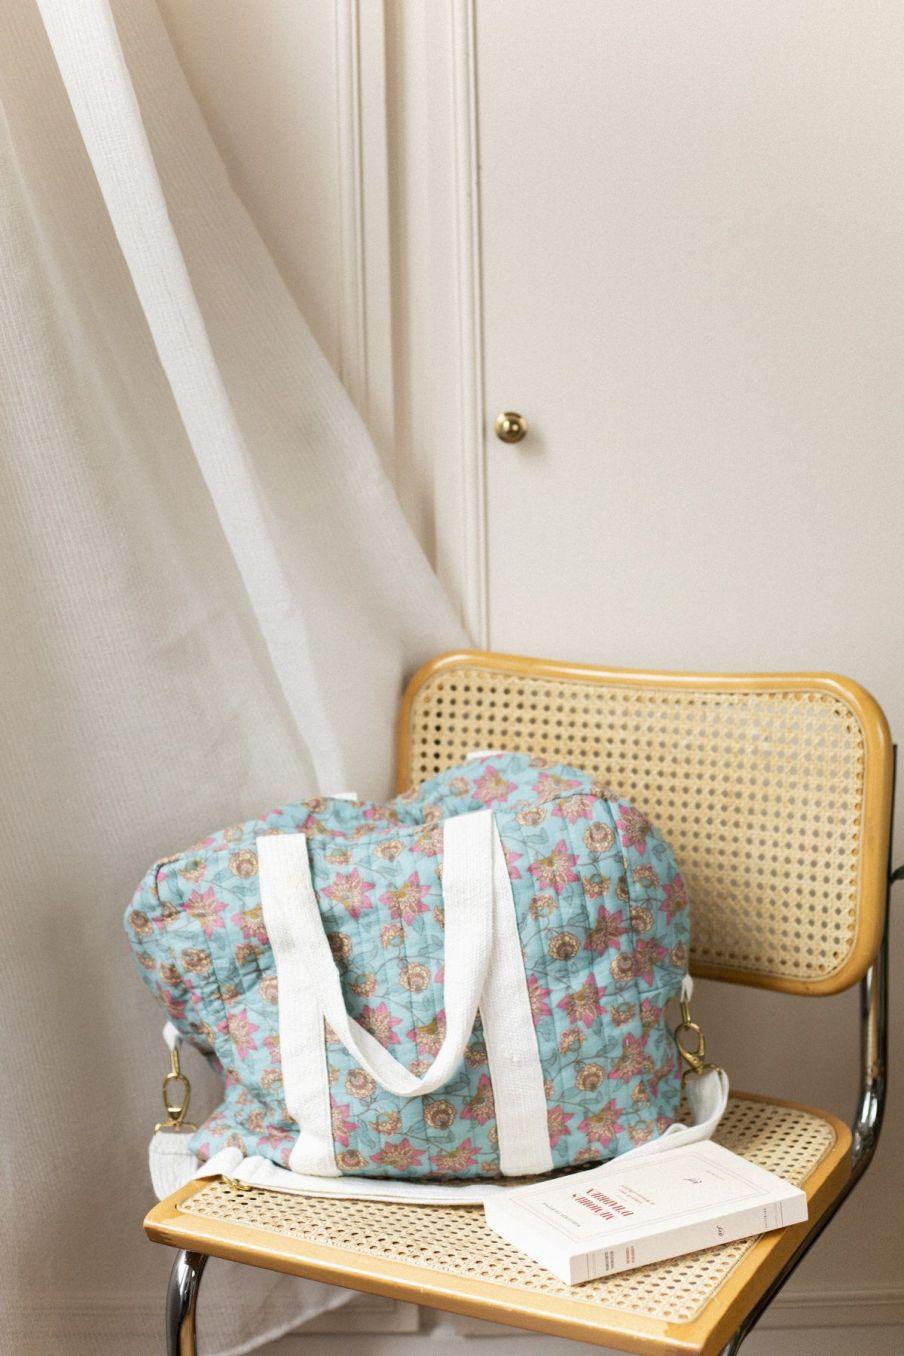 boheme chic vintage sac 48heures maison lilio turquoise flowers